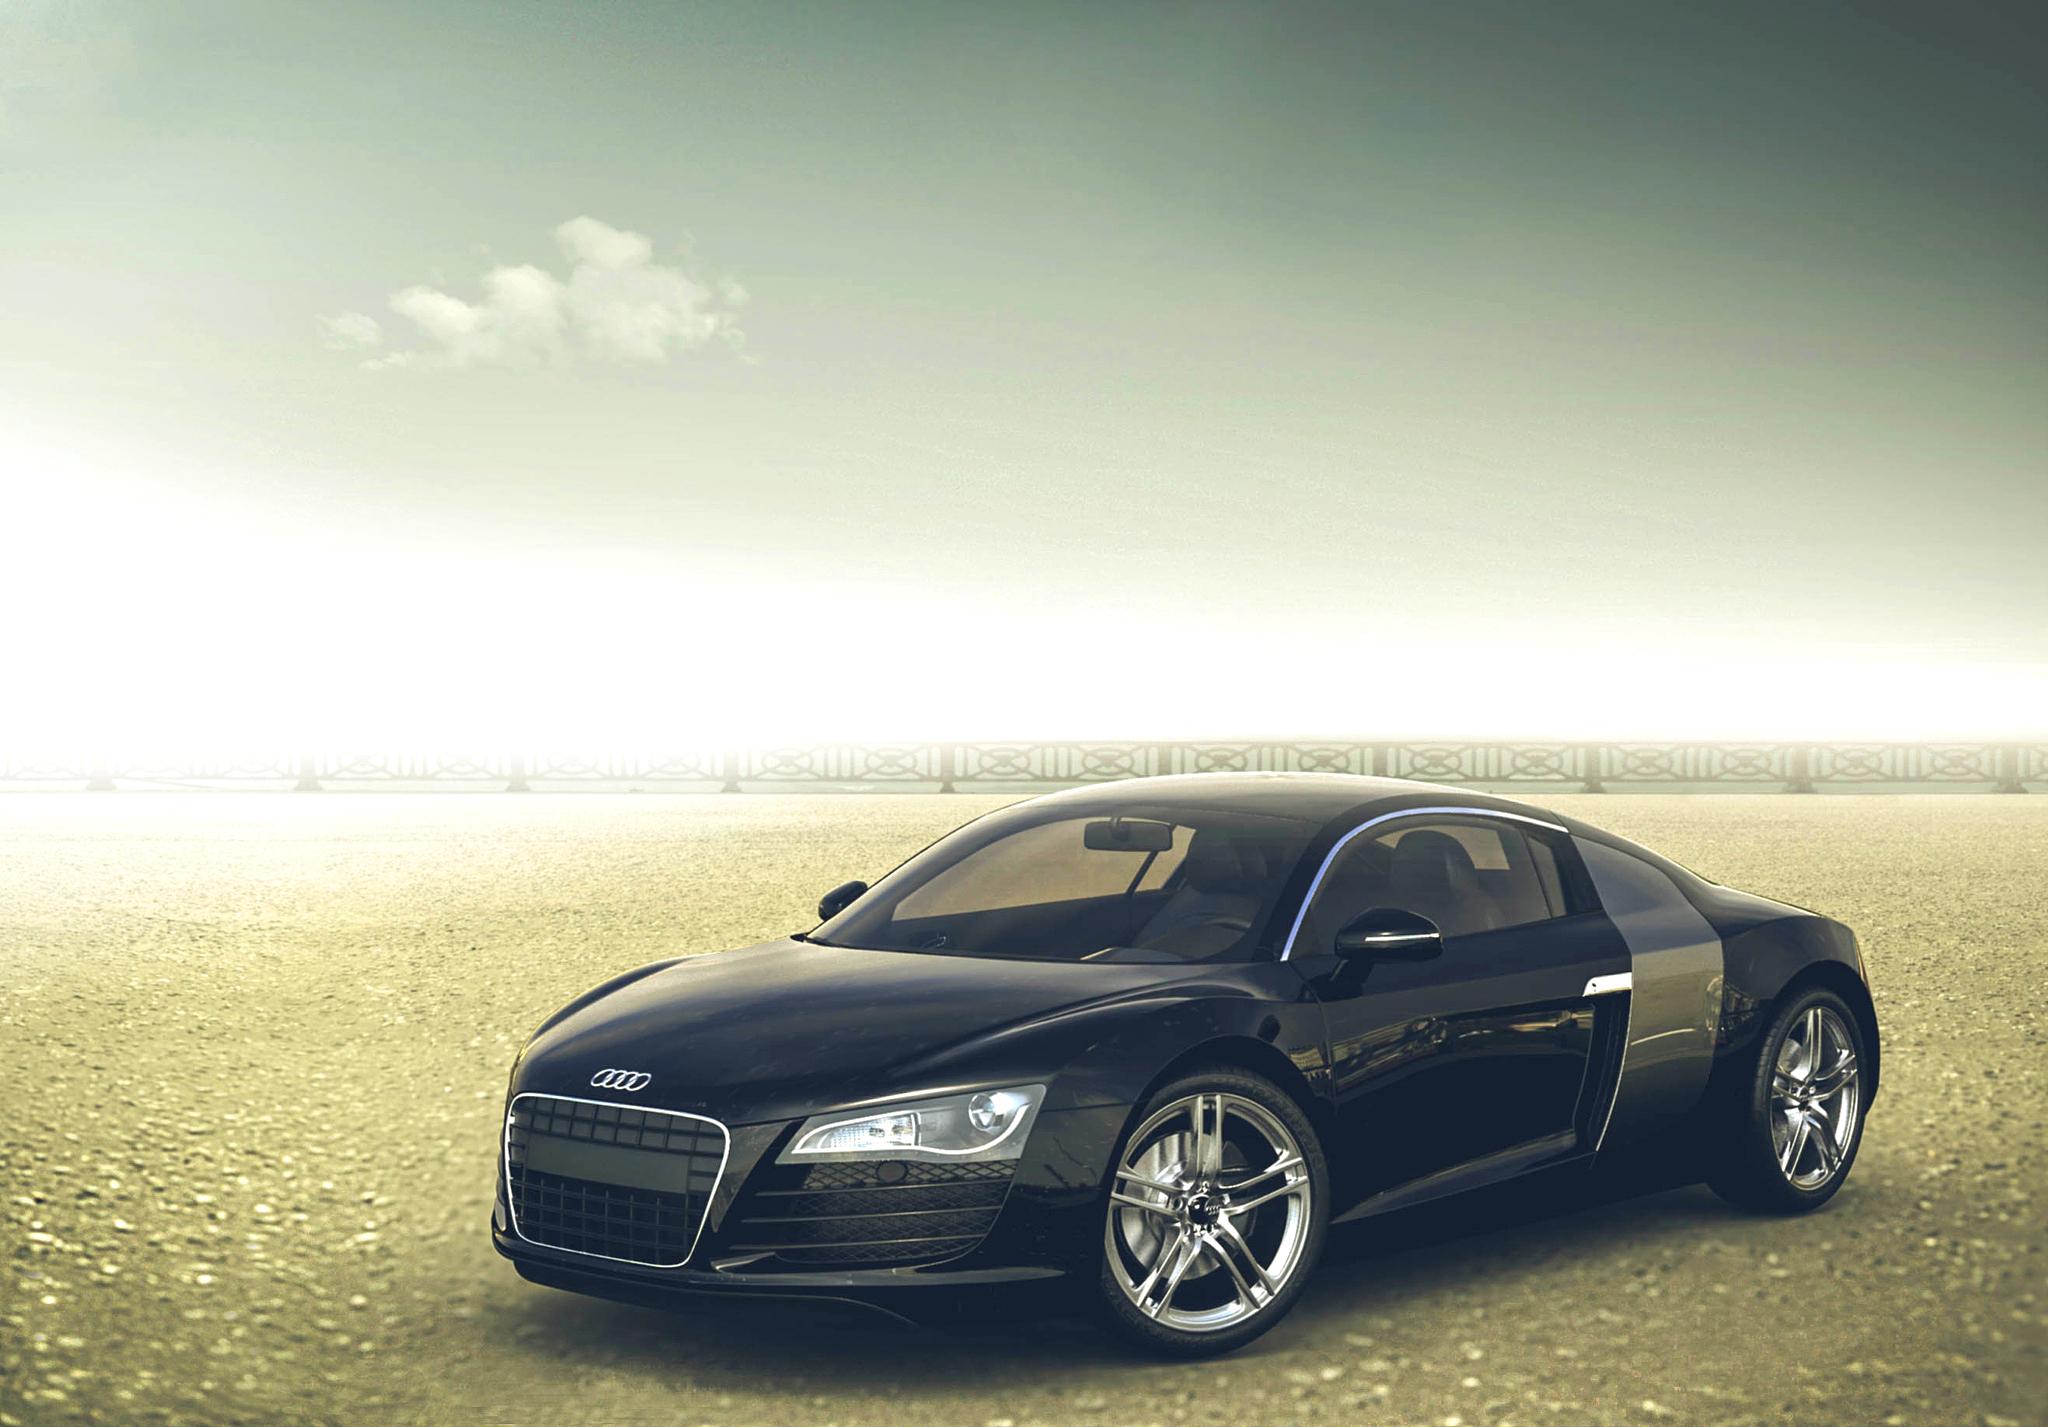 129355 descargar fondo de pantalla Coches, Audi, R8, El Negro, Vista Lateral, Perfil: protectores de pantalla e imágenes gratis